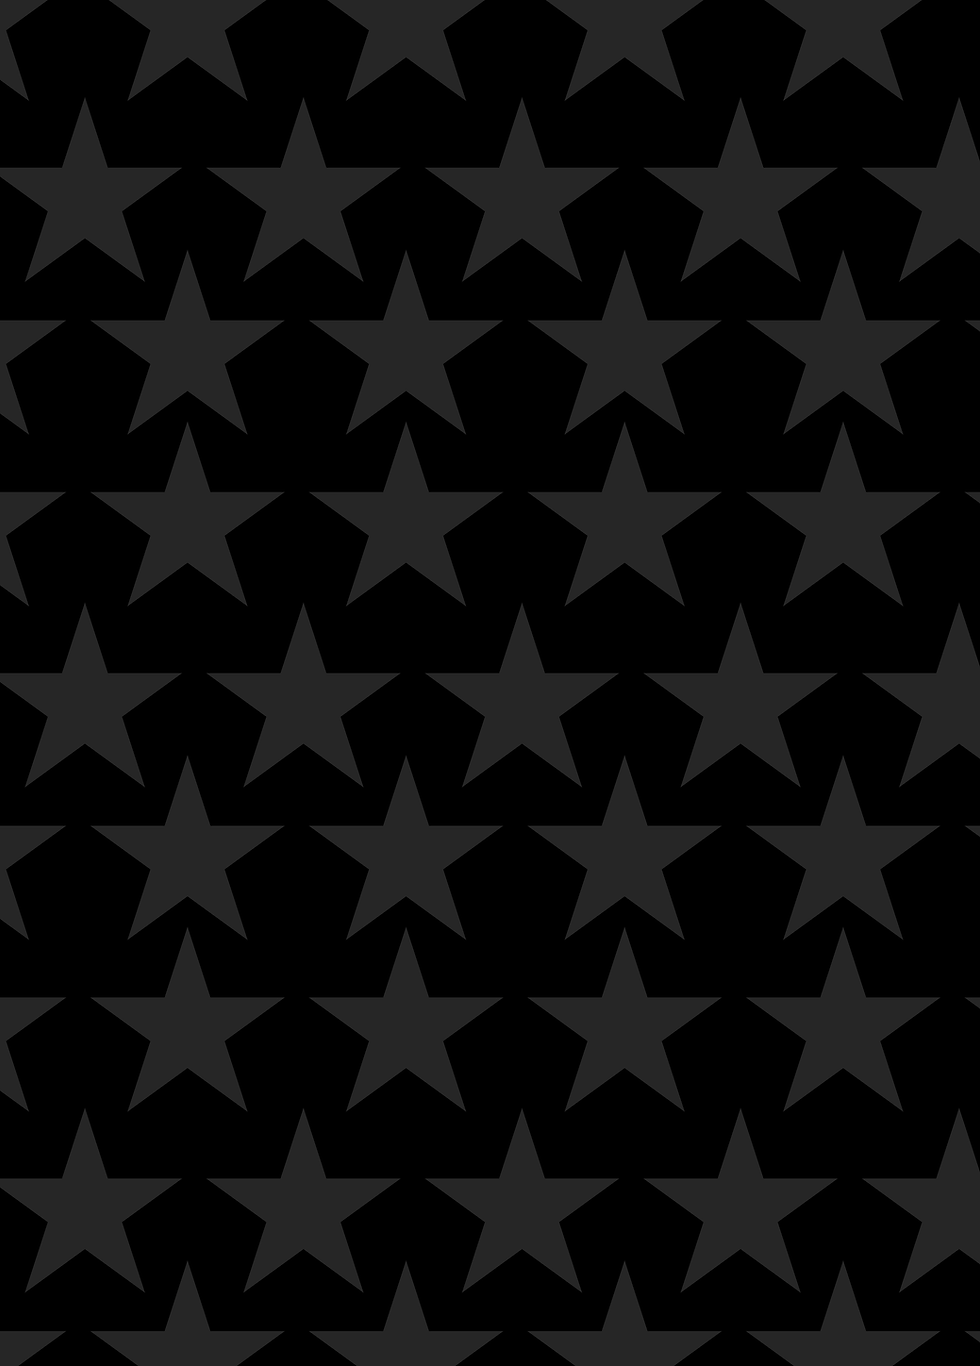 STARS_BLACK.png